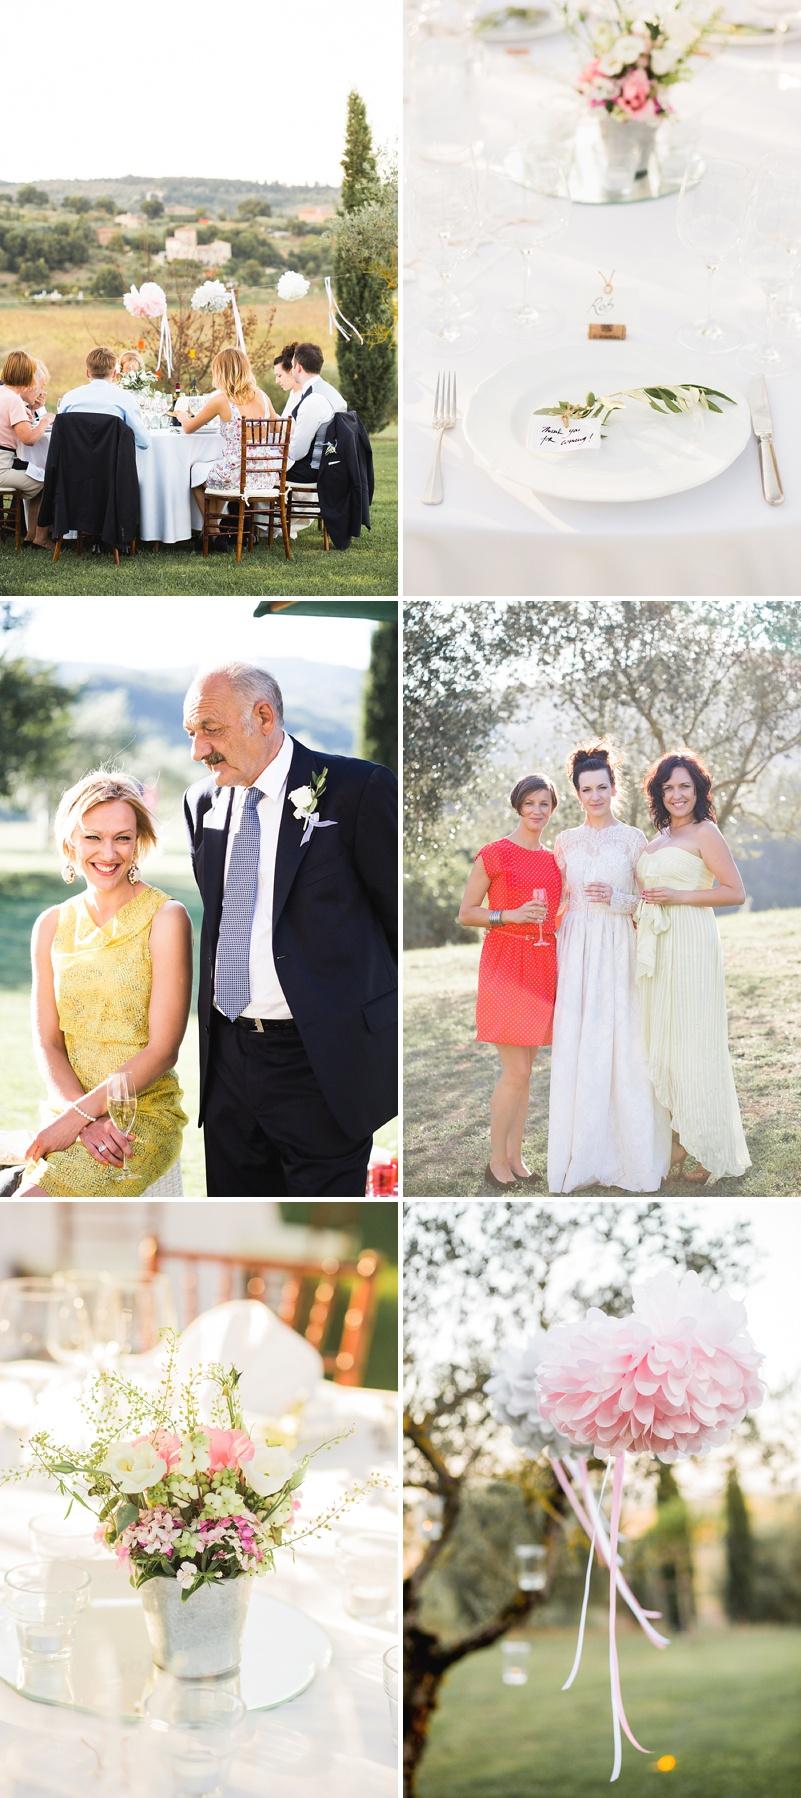 A Italian Destination Wedding In Tuscany with a Katya Katya Shehurina dress._0010